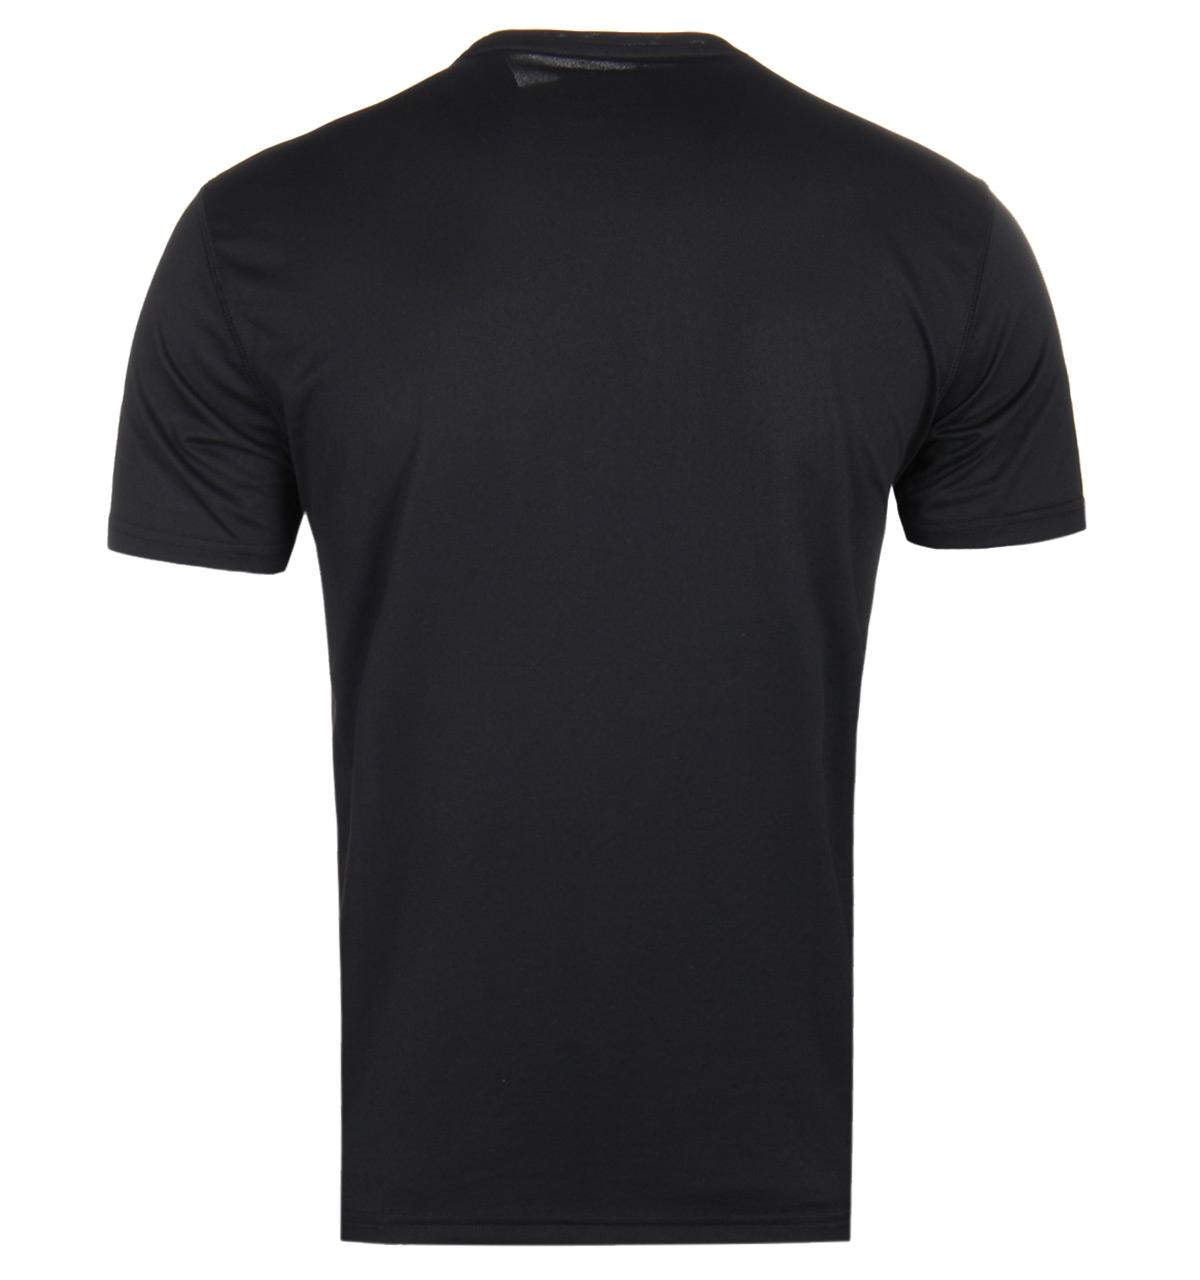 9e4062ab Polo Ralph Lauren - Shield Tech Black Performance Top for Men - Lyst. View  fullscreen